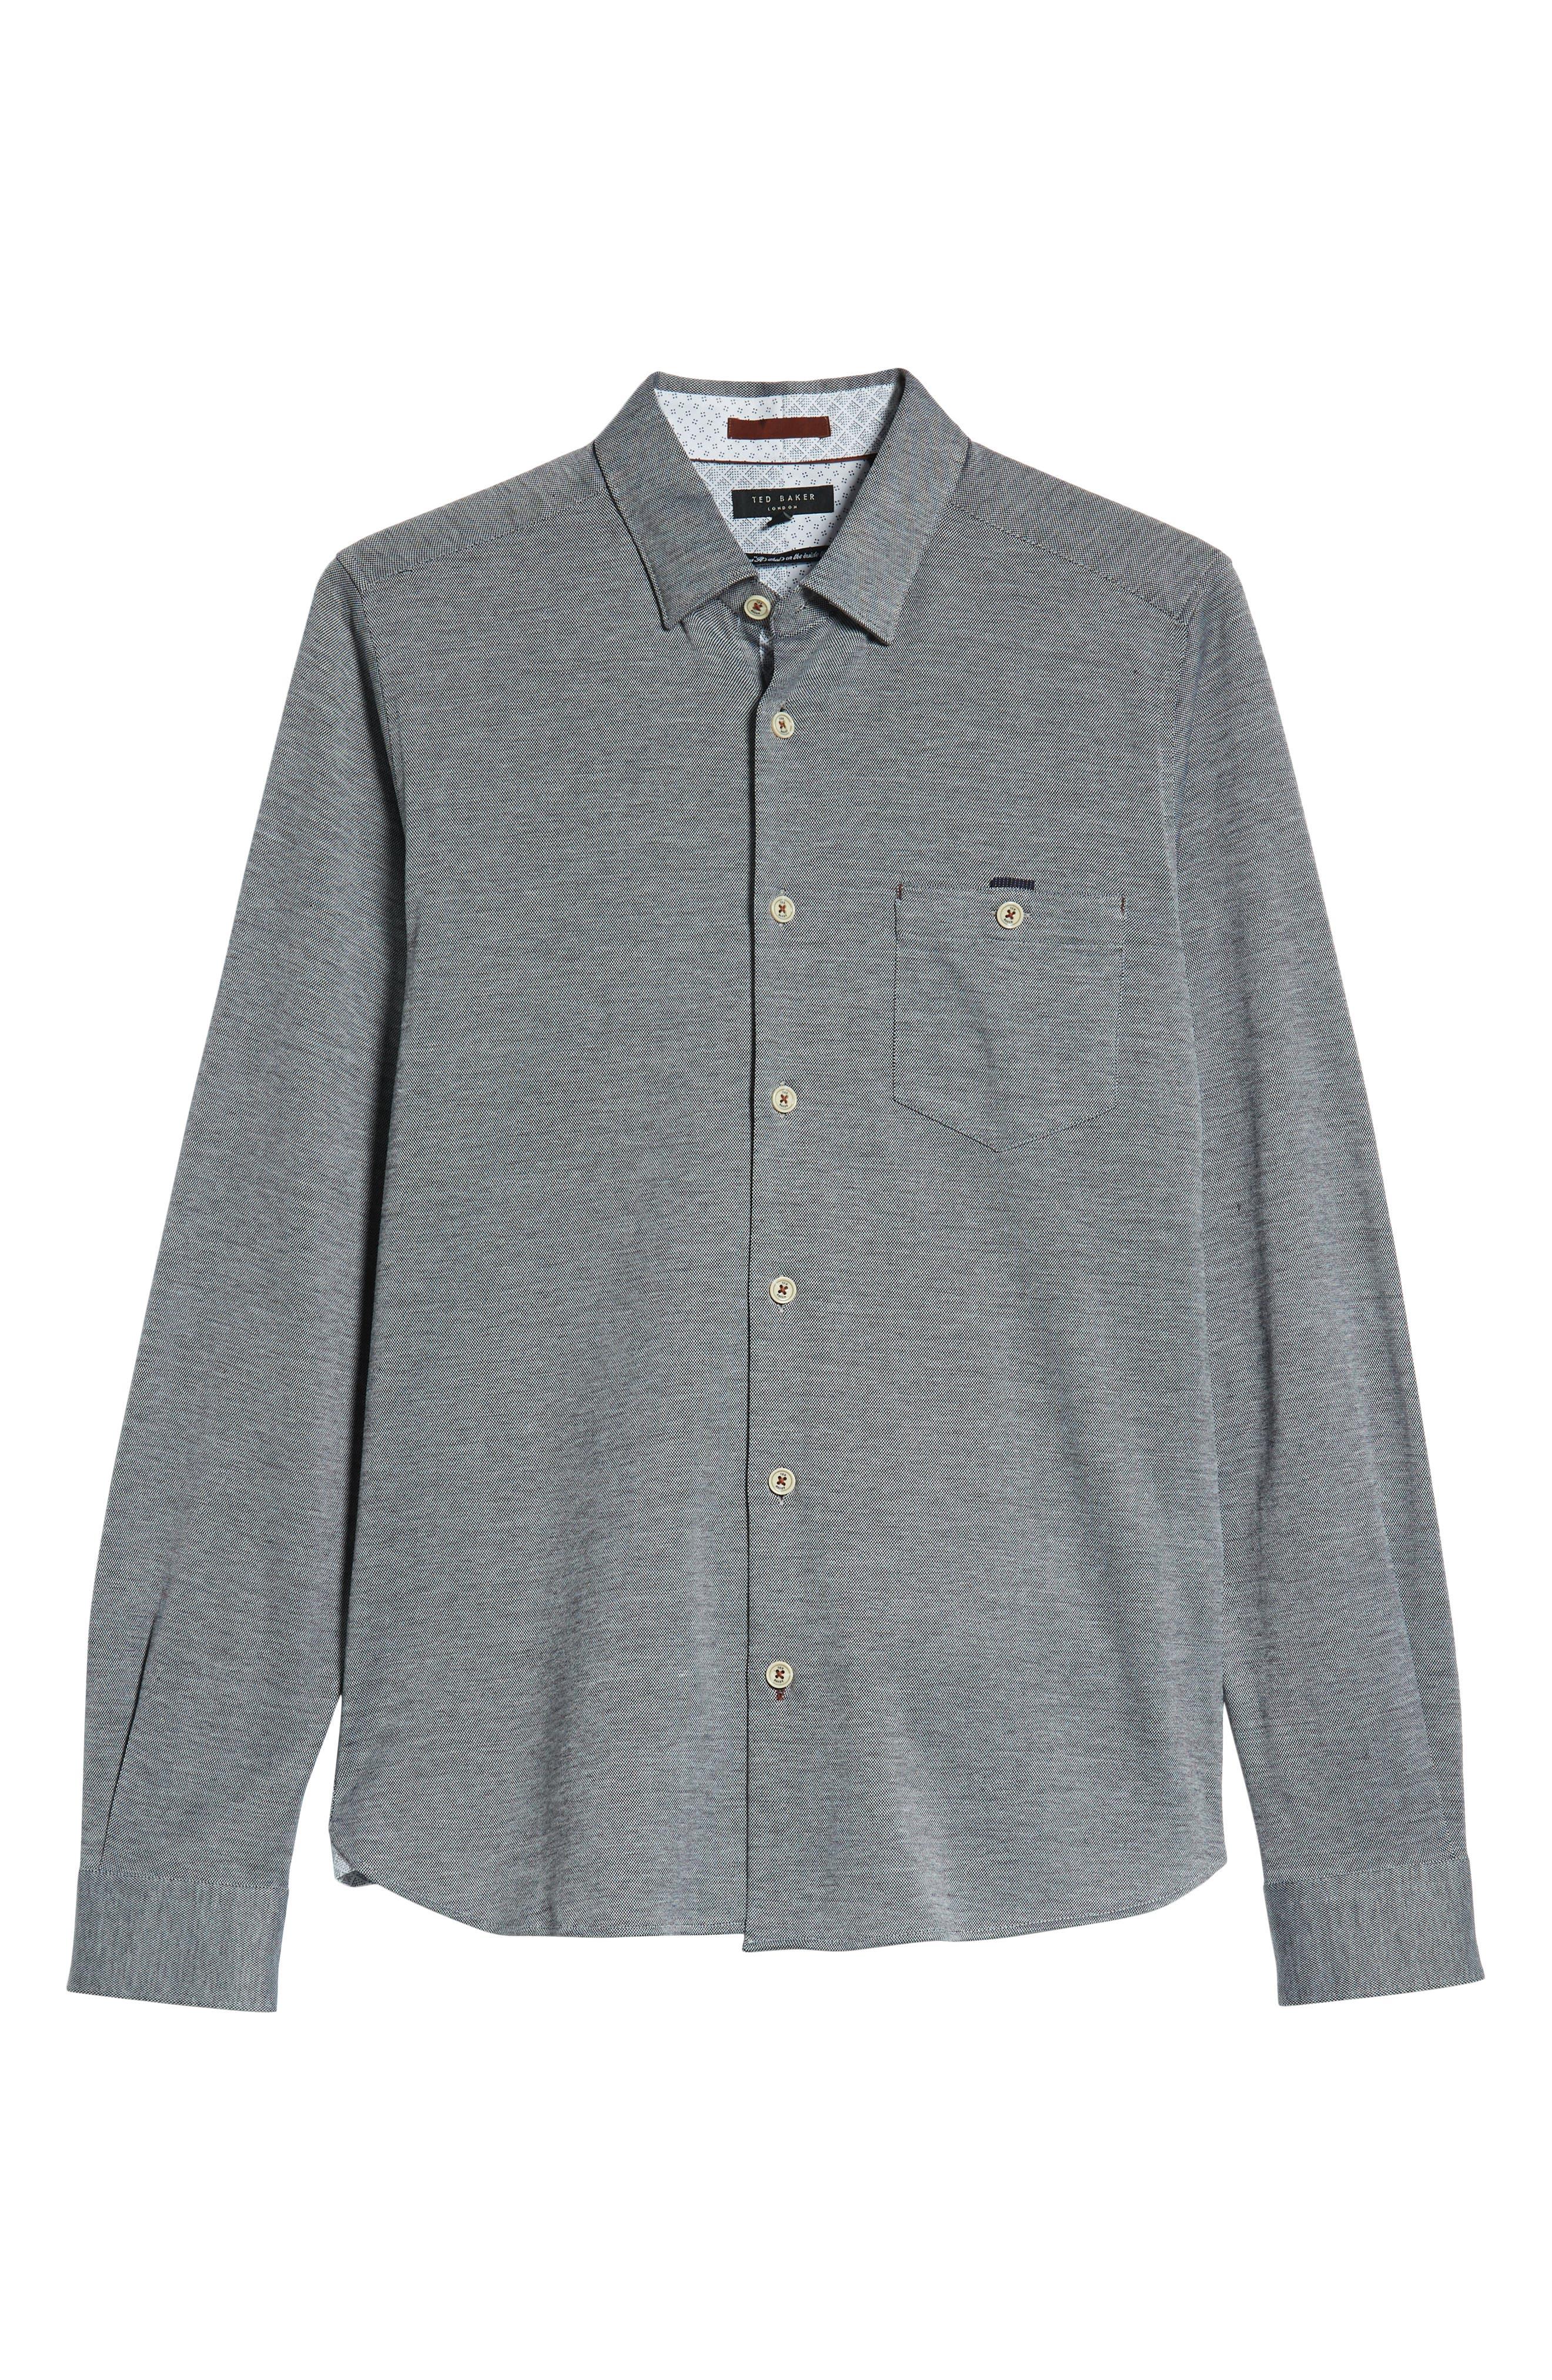 Timothy Slim Fit Cotton Jersey Shirt,                             Alternate thumbnail 6, color,                             BLACK